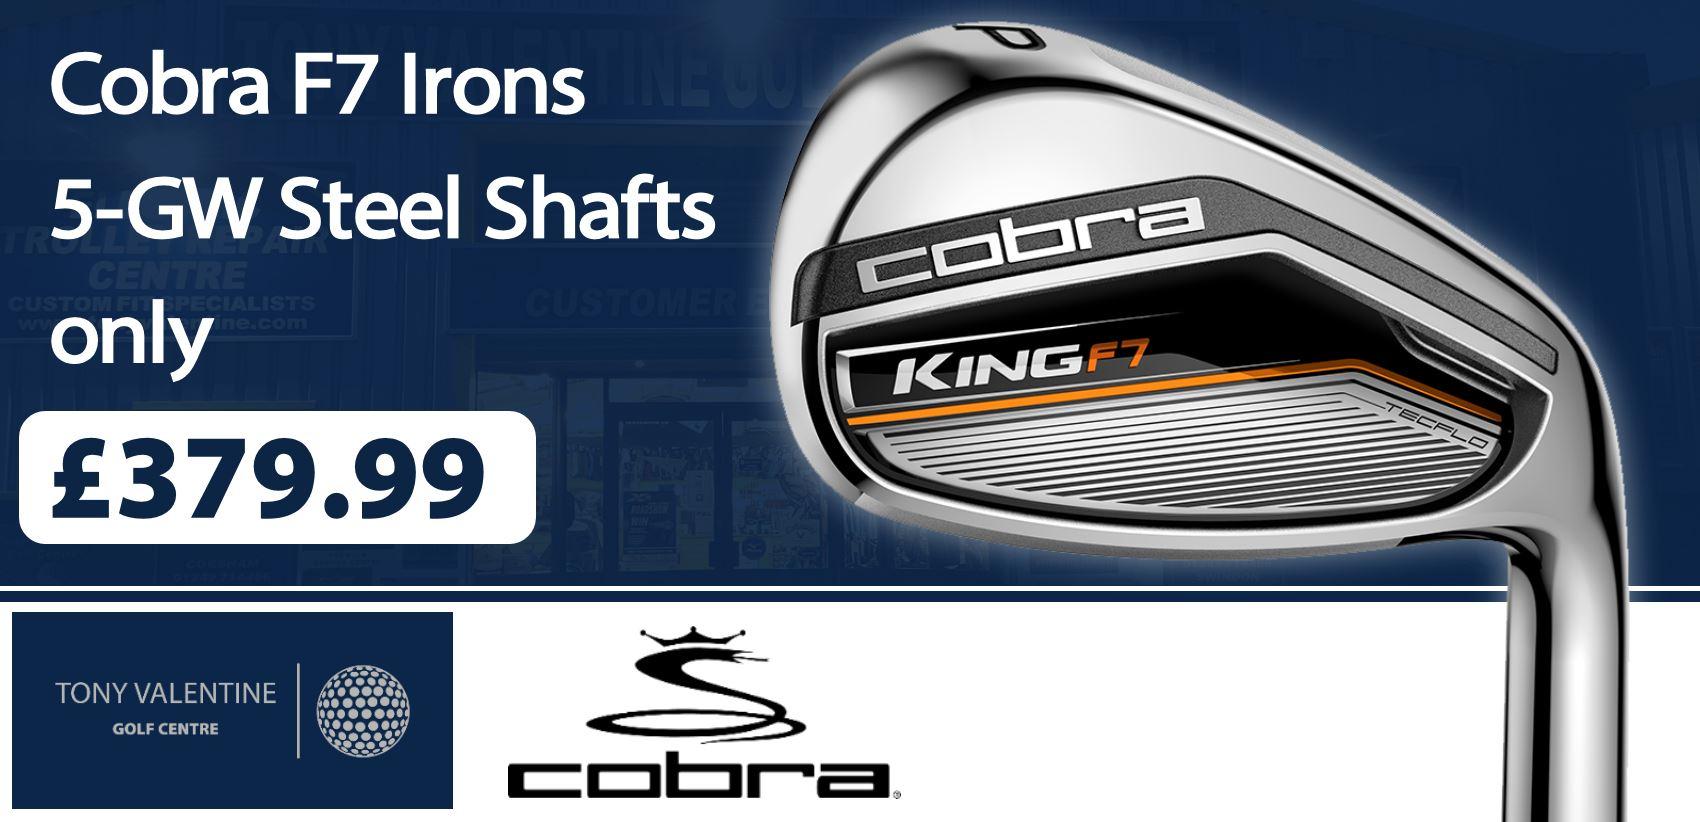 Cobra F7 Irons £349.99